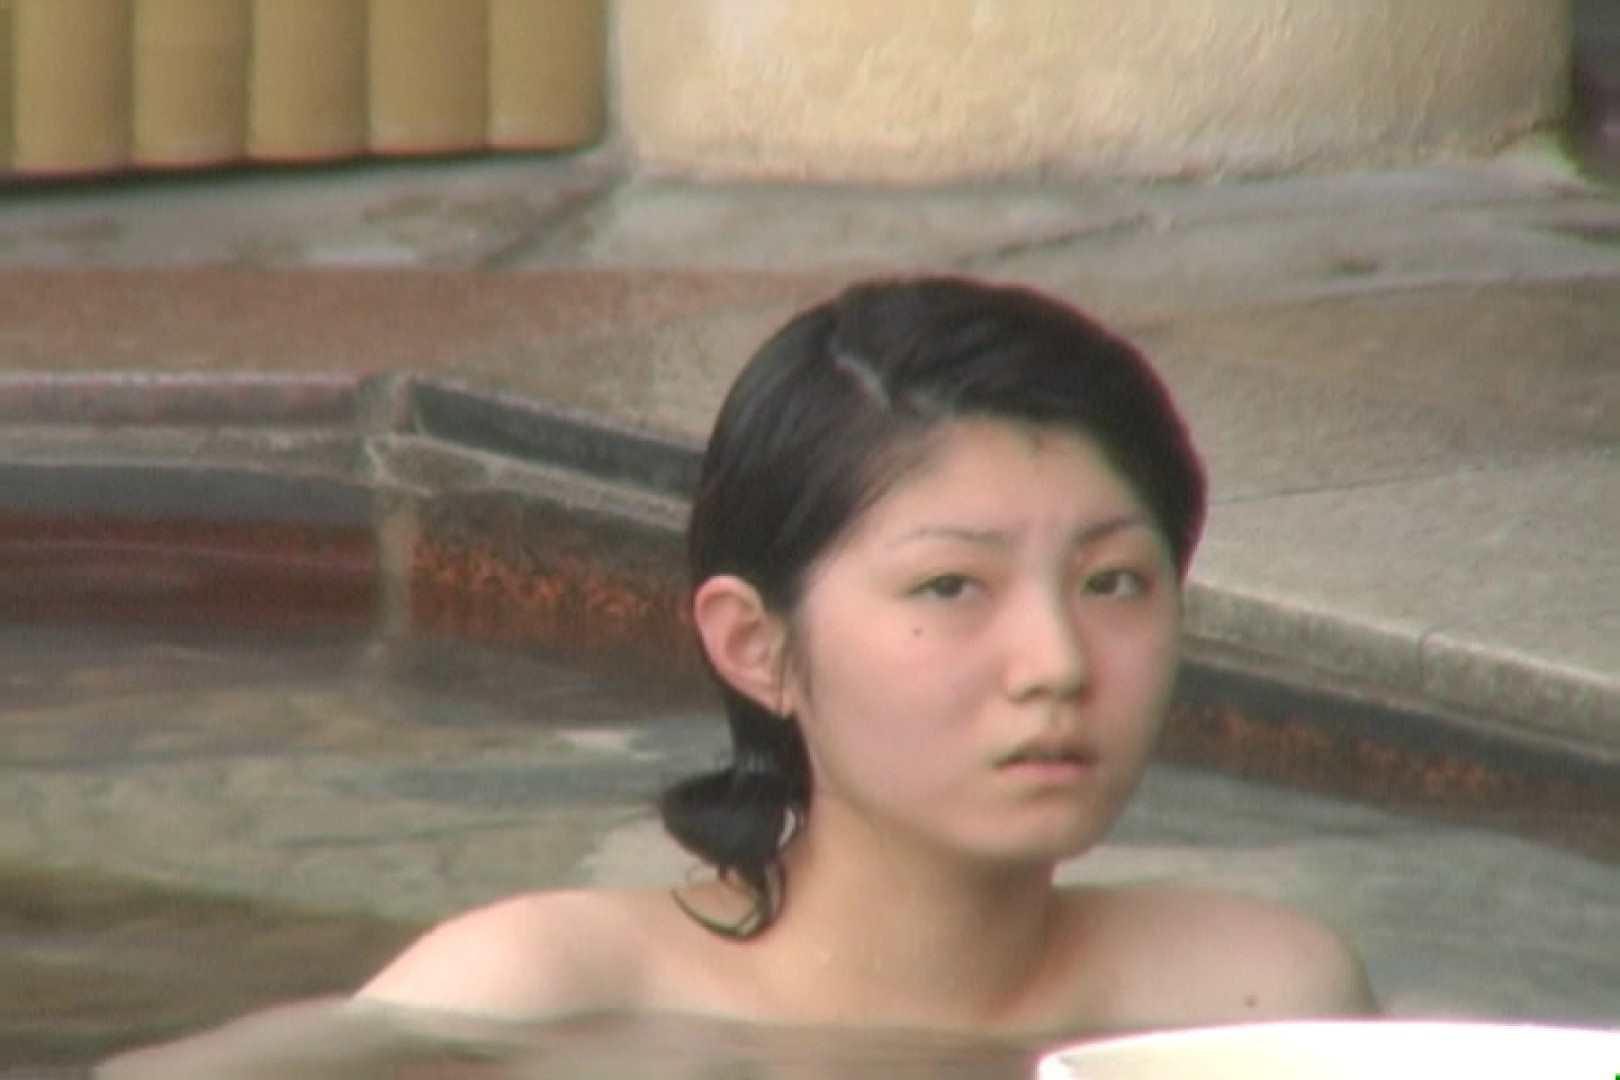 Aquaな露天風呂Vol.579 盗撮 | HなOL  53pic 41